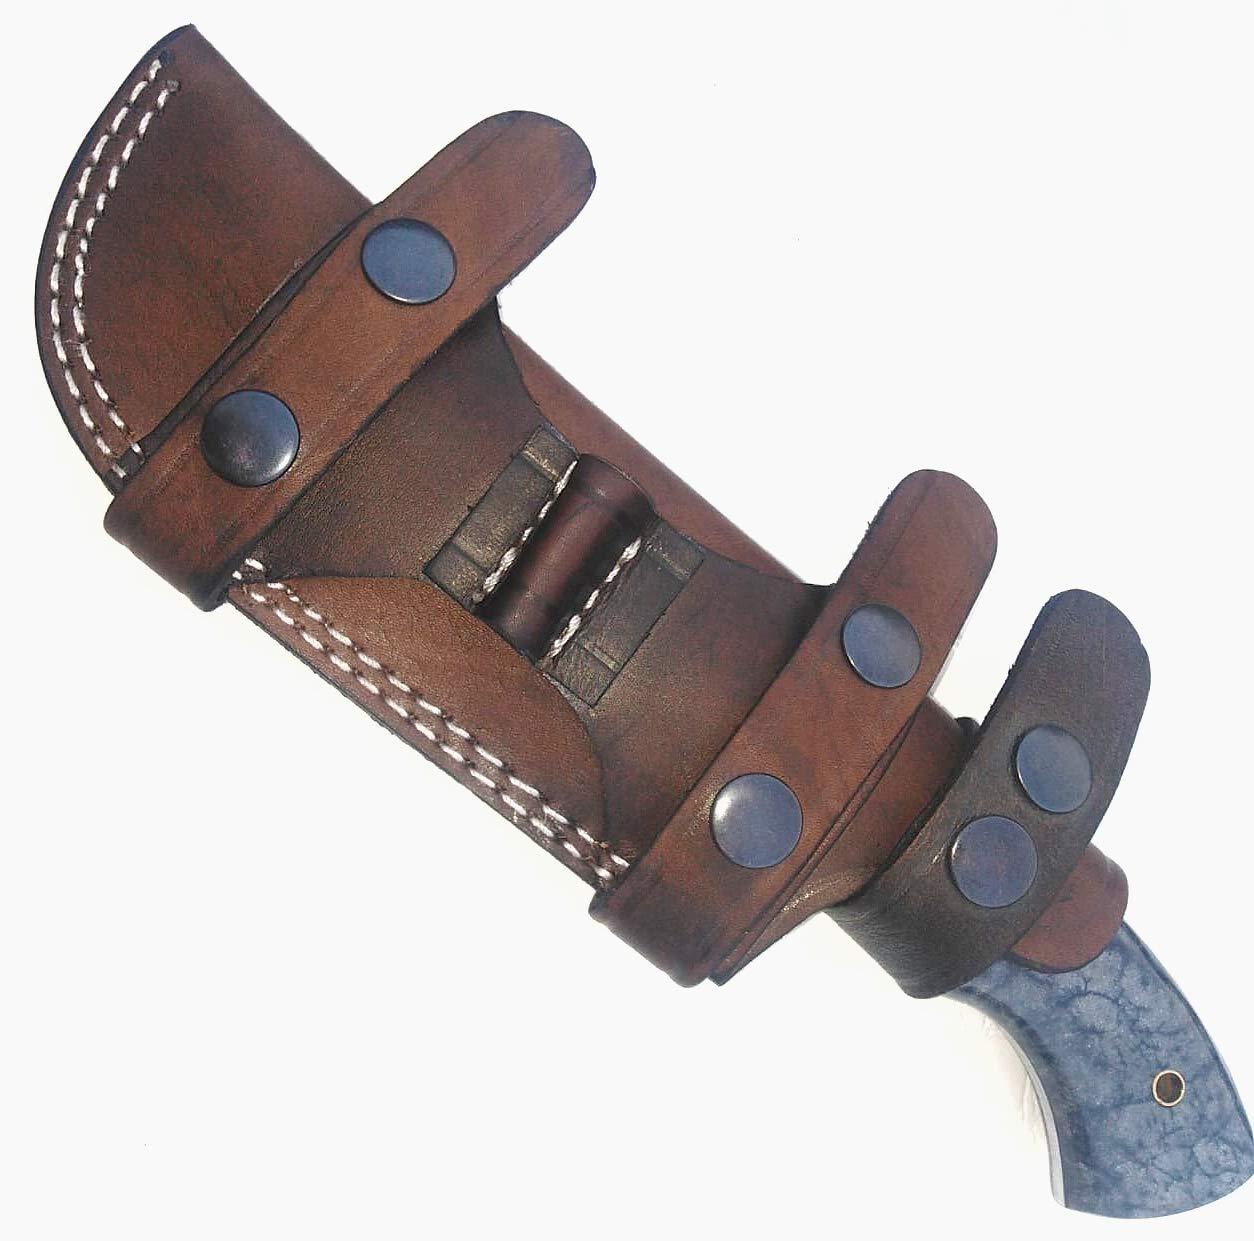 Ottoza Custom Handmade Dark Brown Right Hand Leather Knife Sheath for Bushcraft Knife - Hunting Knife - Camping Knife - Survival Knife - Skinning Knife Horizontal Scout/Cow - Buffalo Leather No:2 by Ottoza